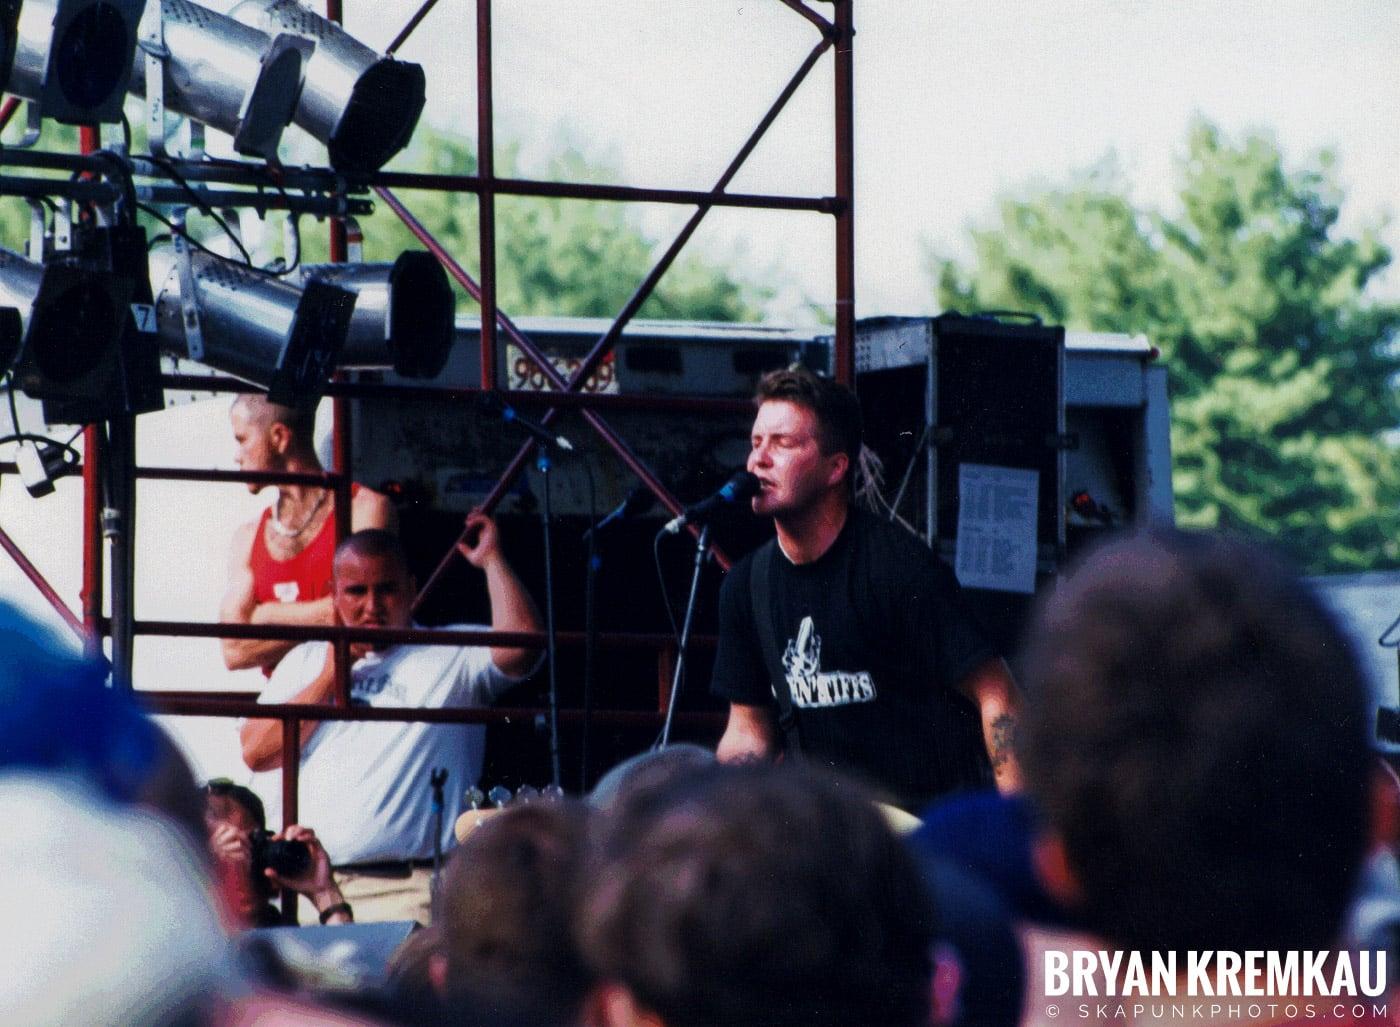 The Dropkick Murphys @ New England Ska Fest 98, Westford, MA - 8.22.98 (6)